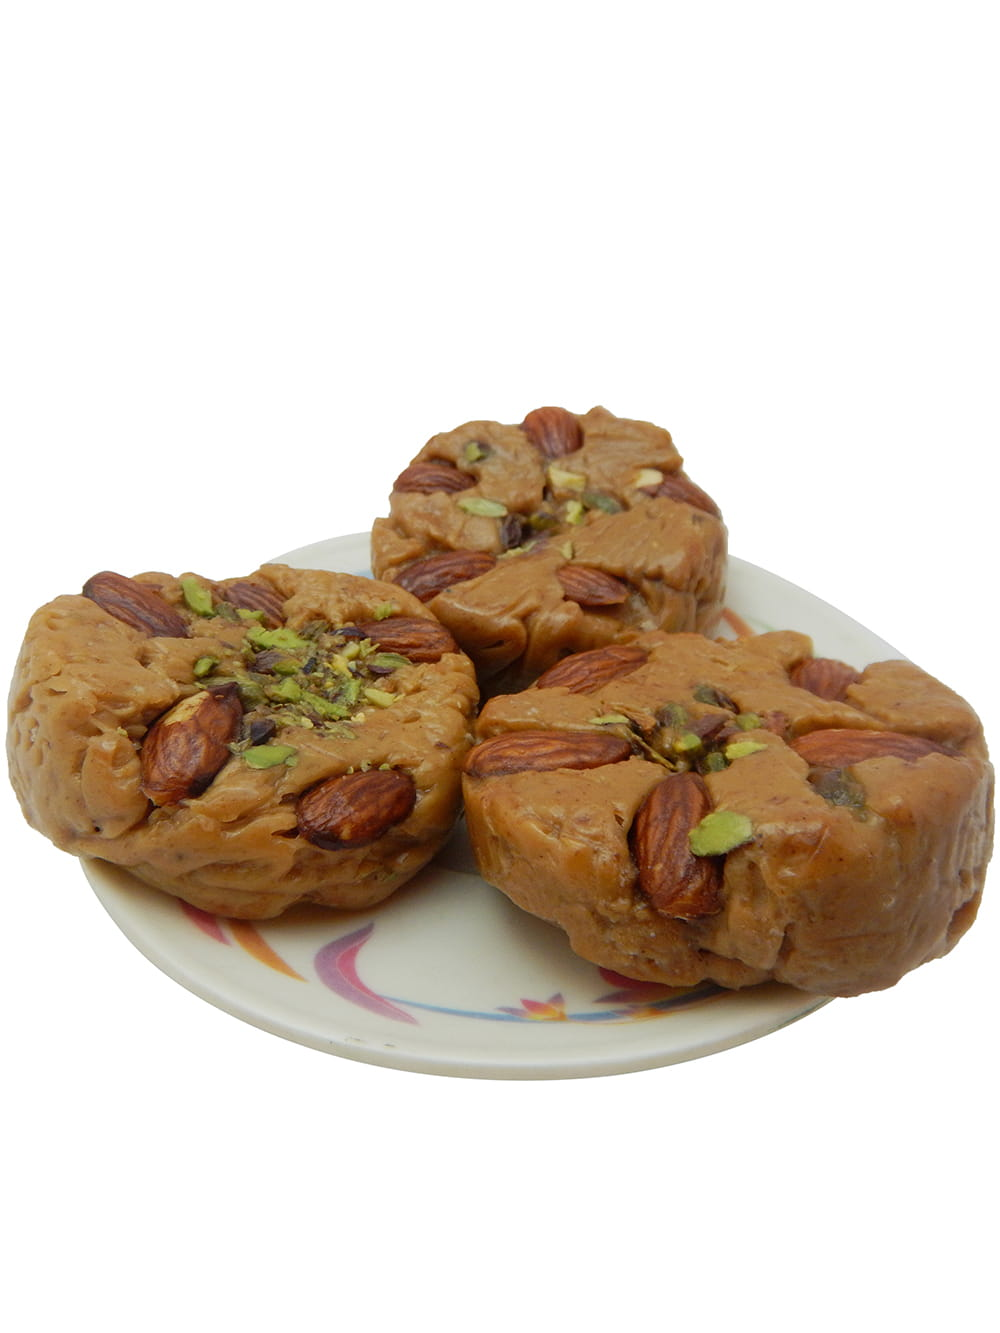 Sohan Halwa Badam Pista Kanwarji Buy Send Shop